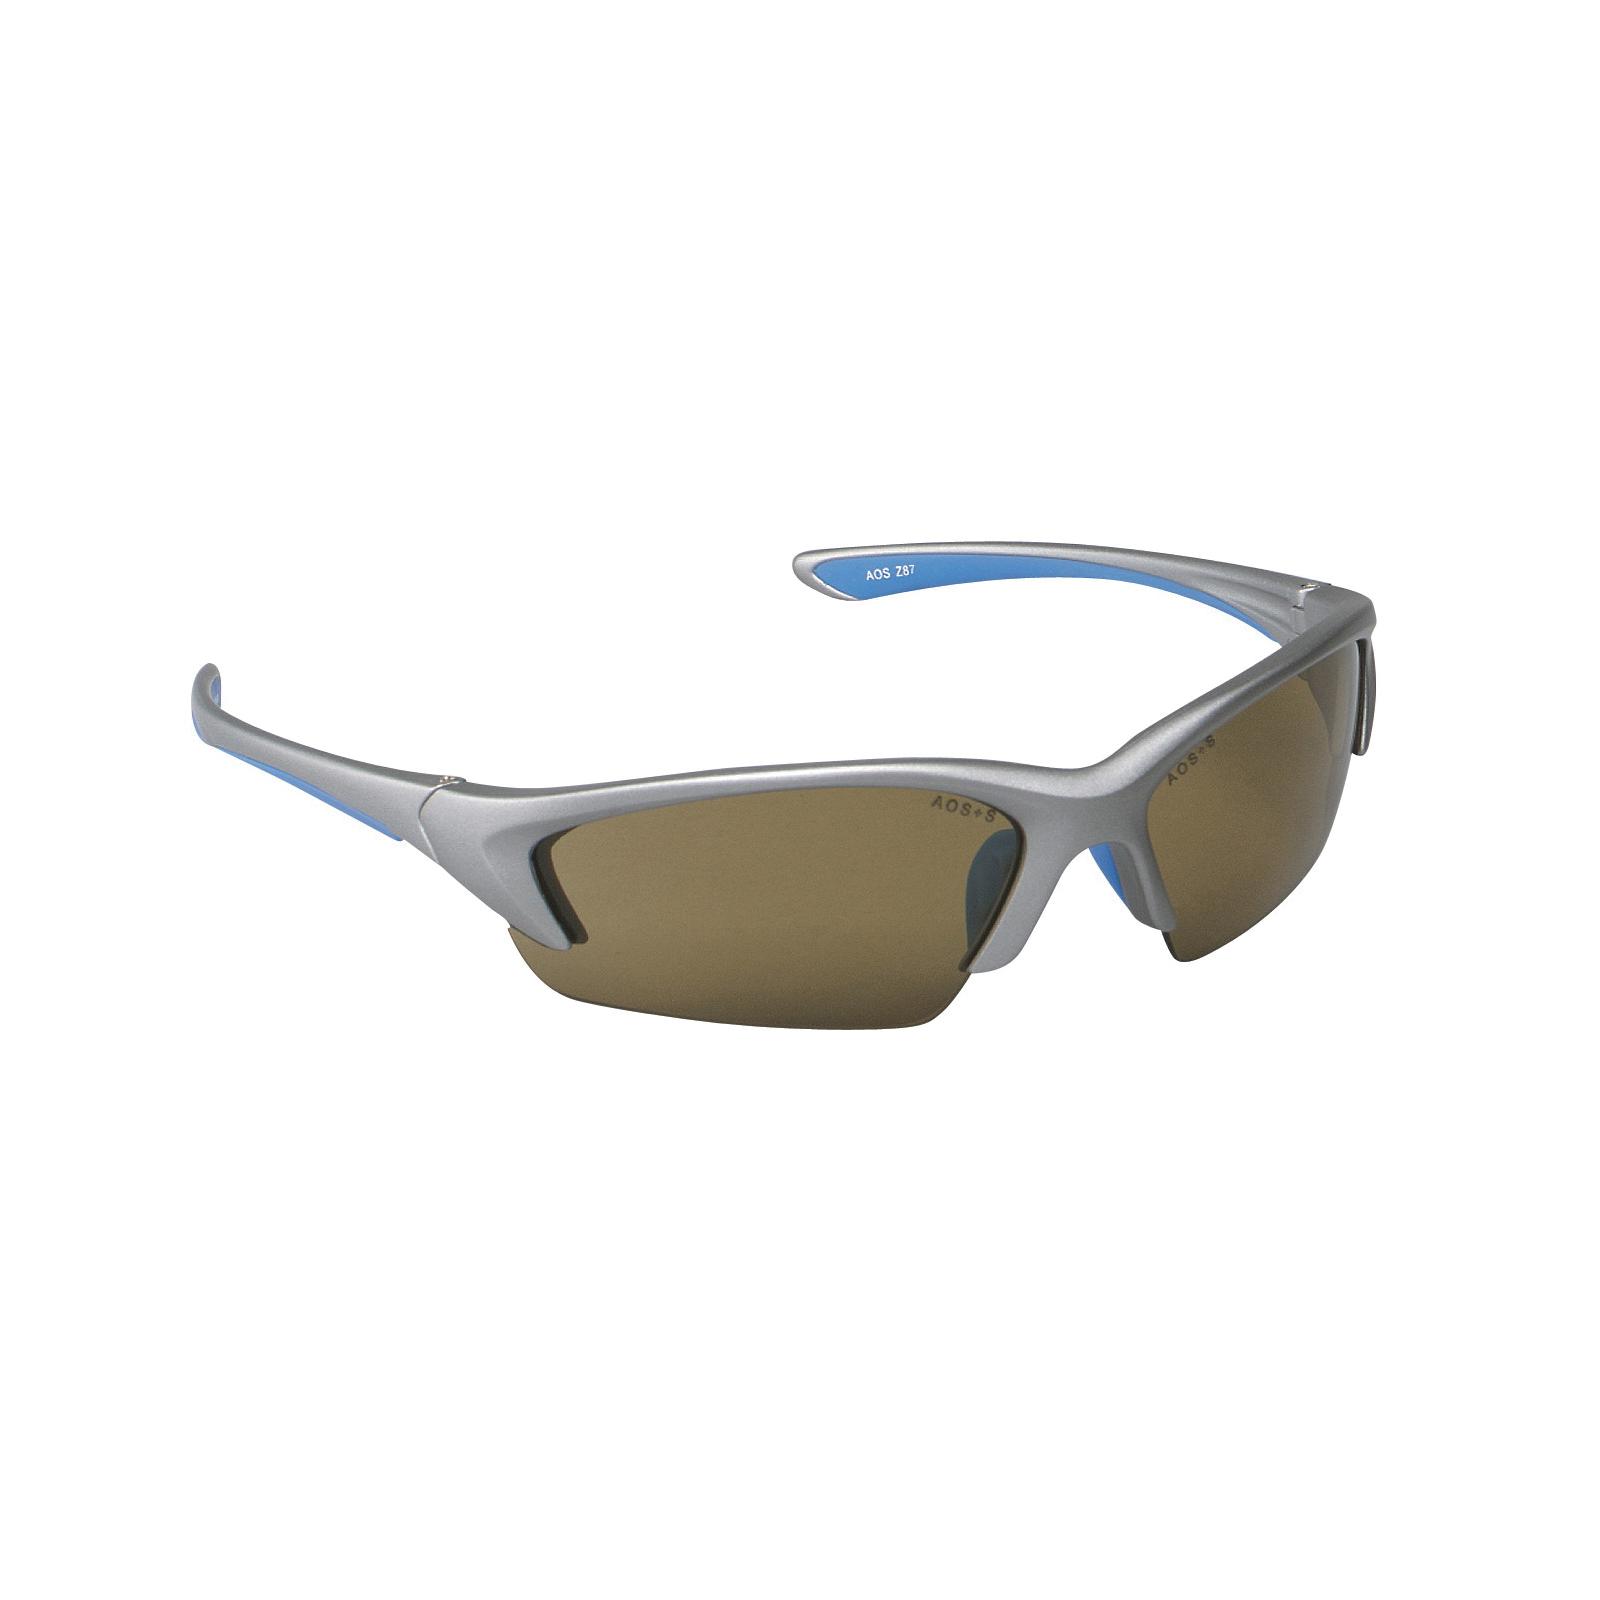 3M™ Nitrous™ 078371-62160 11712-00000-20 Value Range Protective Eyewear, Anti-Fog Bronze Lens, Half Framed Silver Plastic Frame, Polycarbonate Lens, Specifications Met: ANSI Z87.1-2015